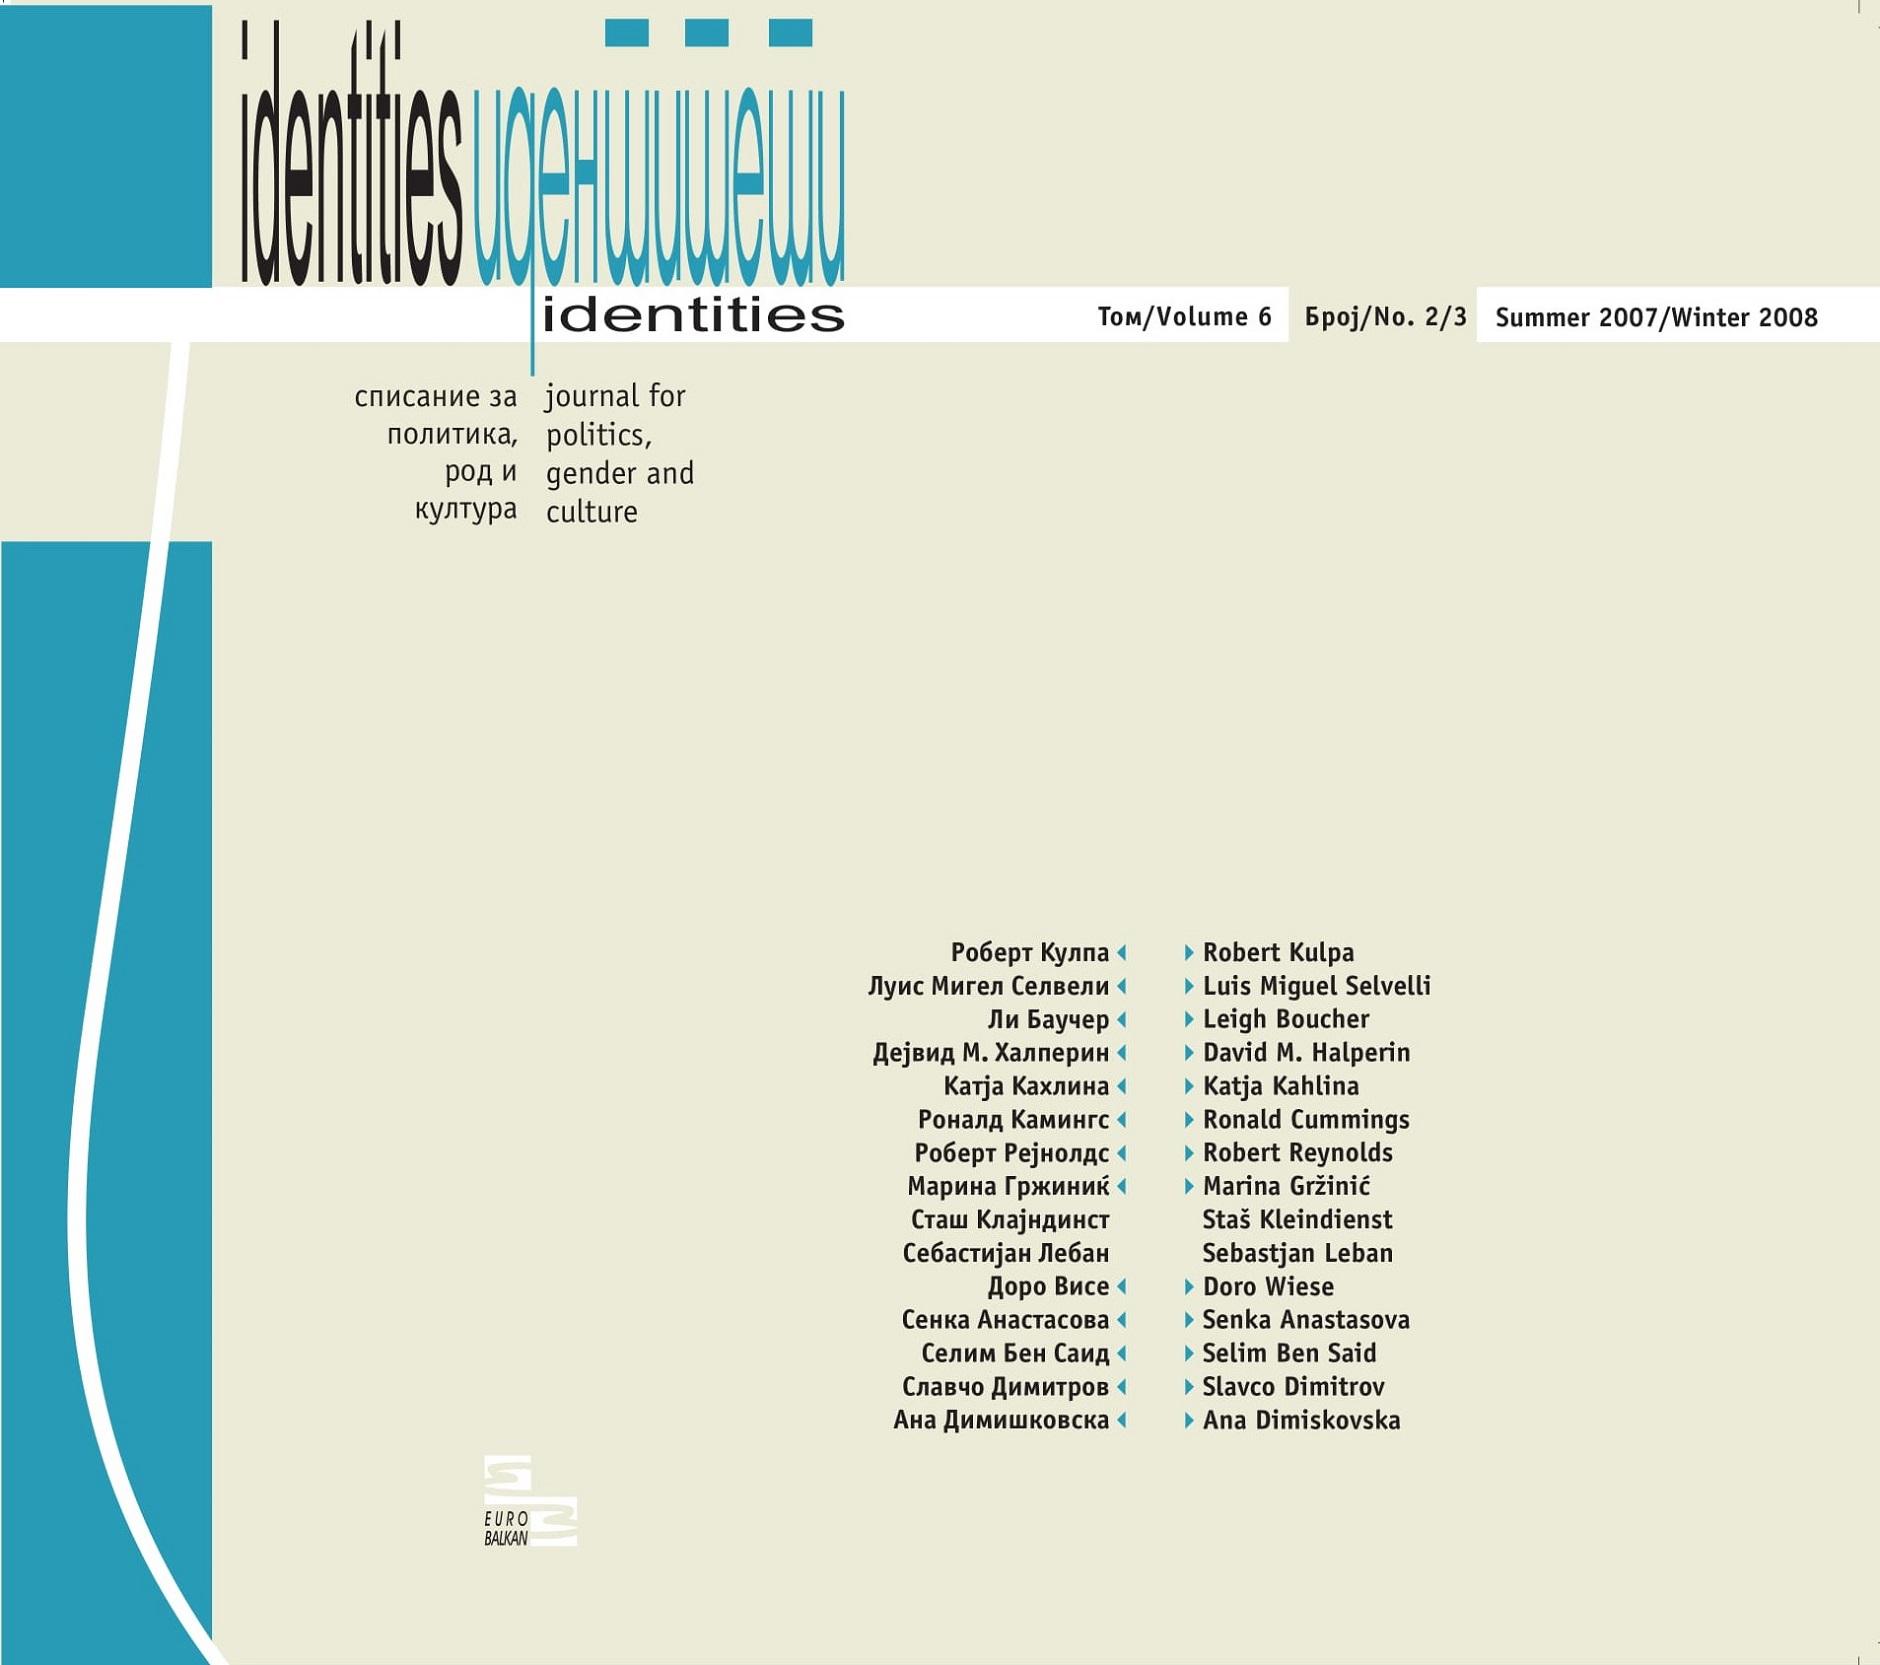 View Vol. 6 No. 2-3 (2007): Vol. 6, No. 2-3 (Summer 2007 - Winter 2008) - Issues No. 13-14 | edited by Alexander Lambevski